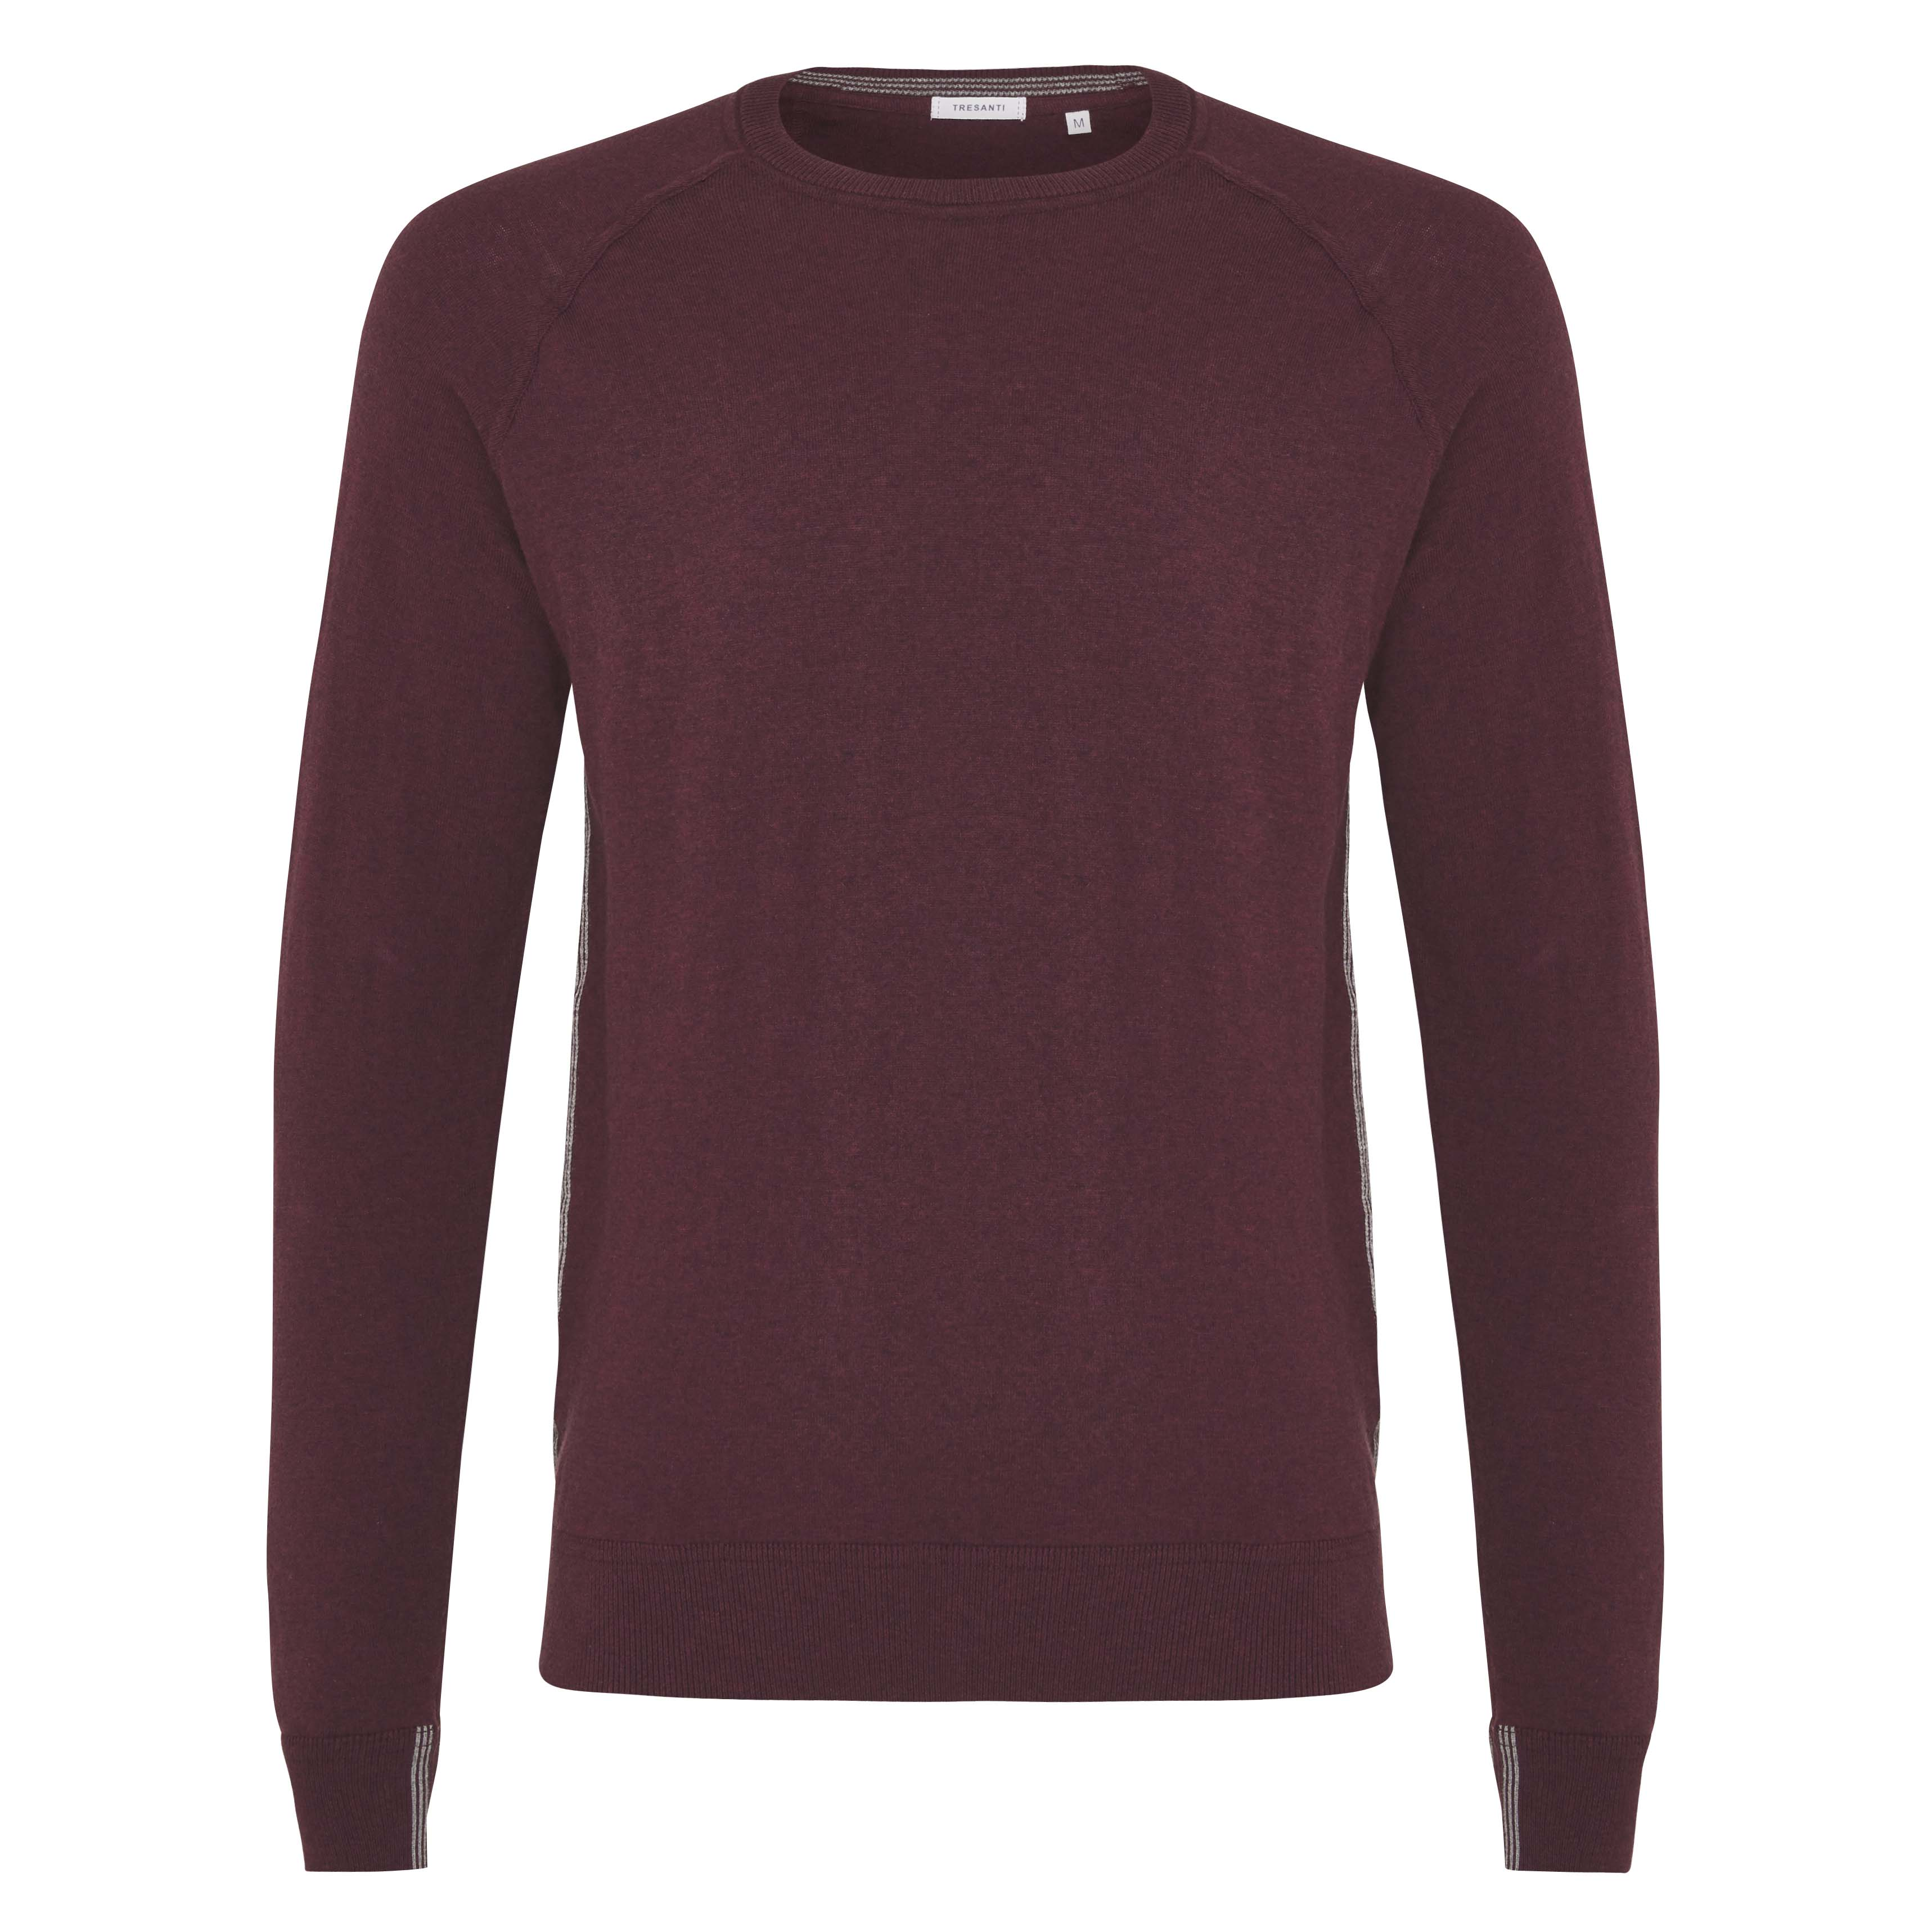 James | Pullover raglan burgundy